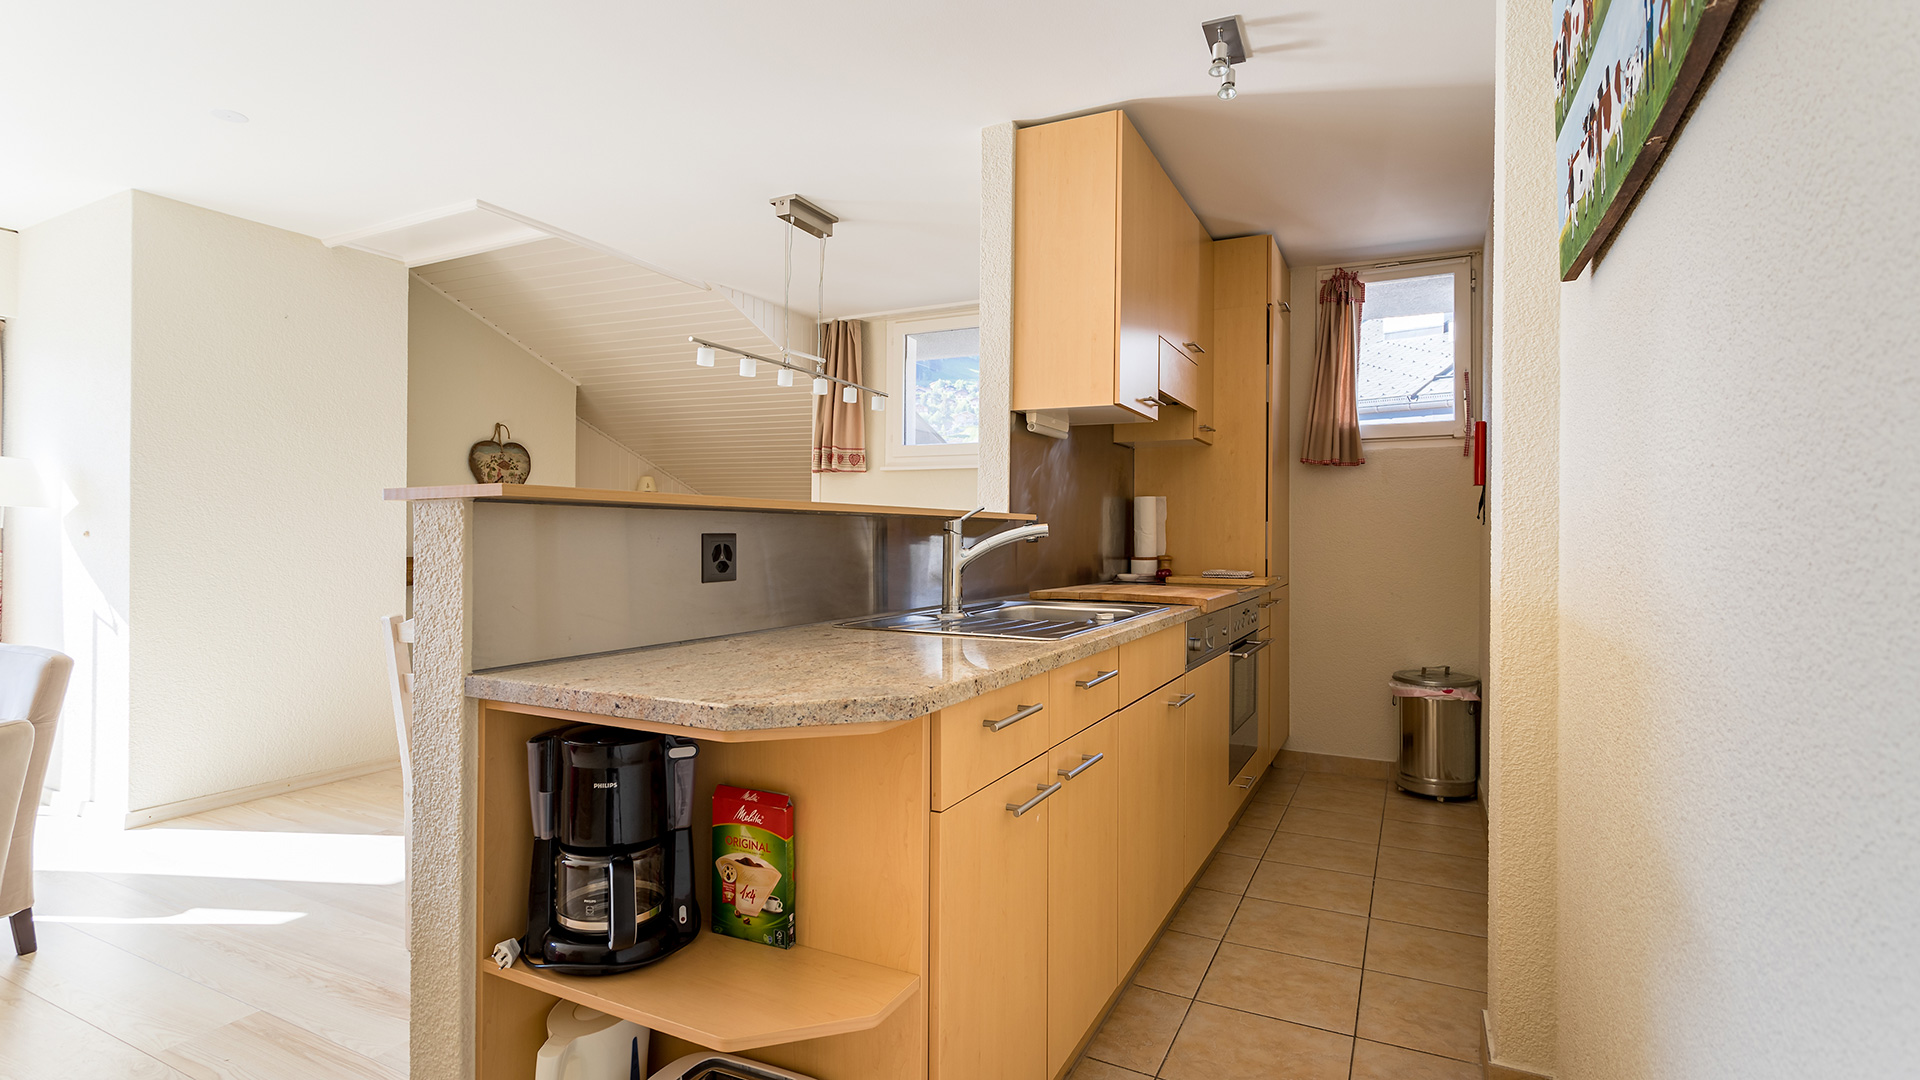 Cerisiers A4 Apartments, Switzerland